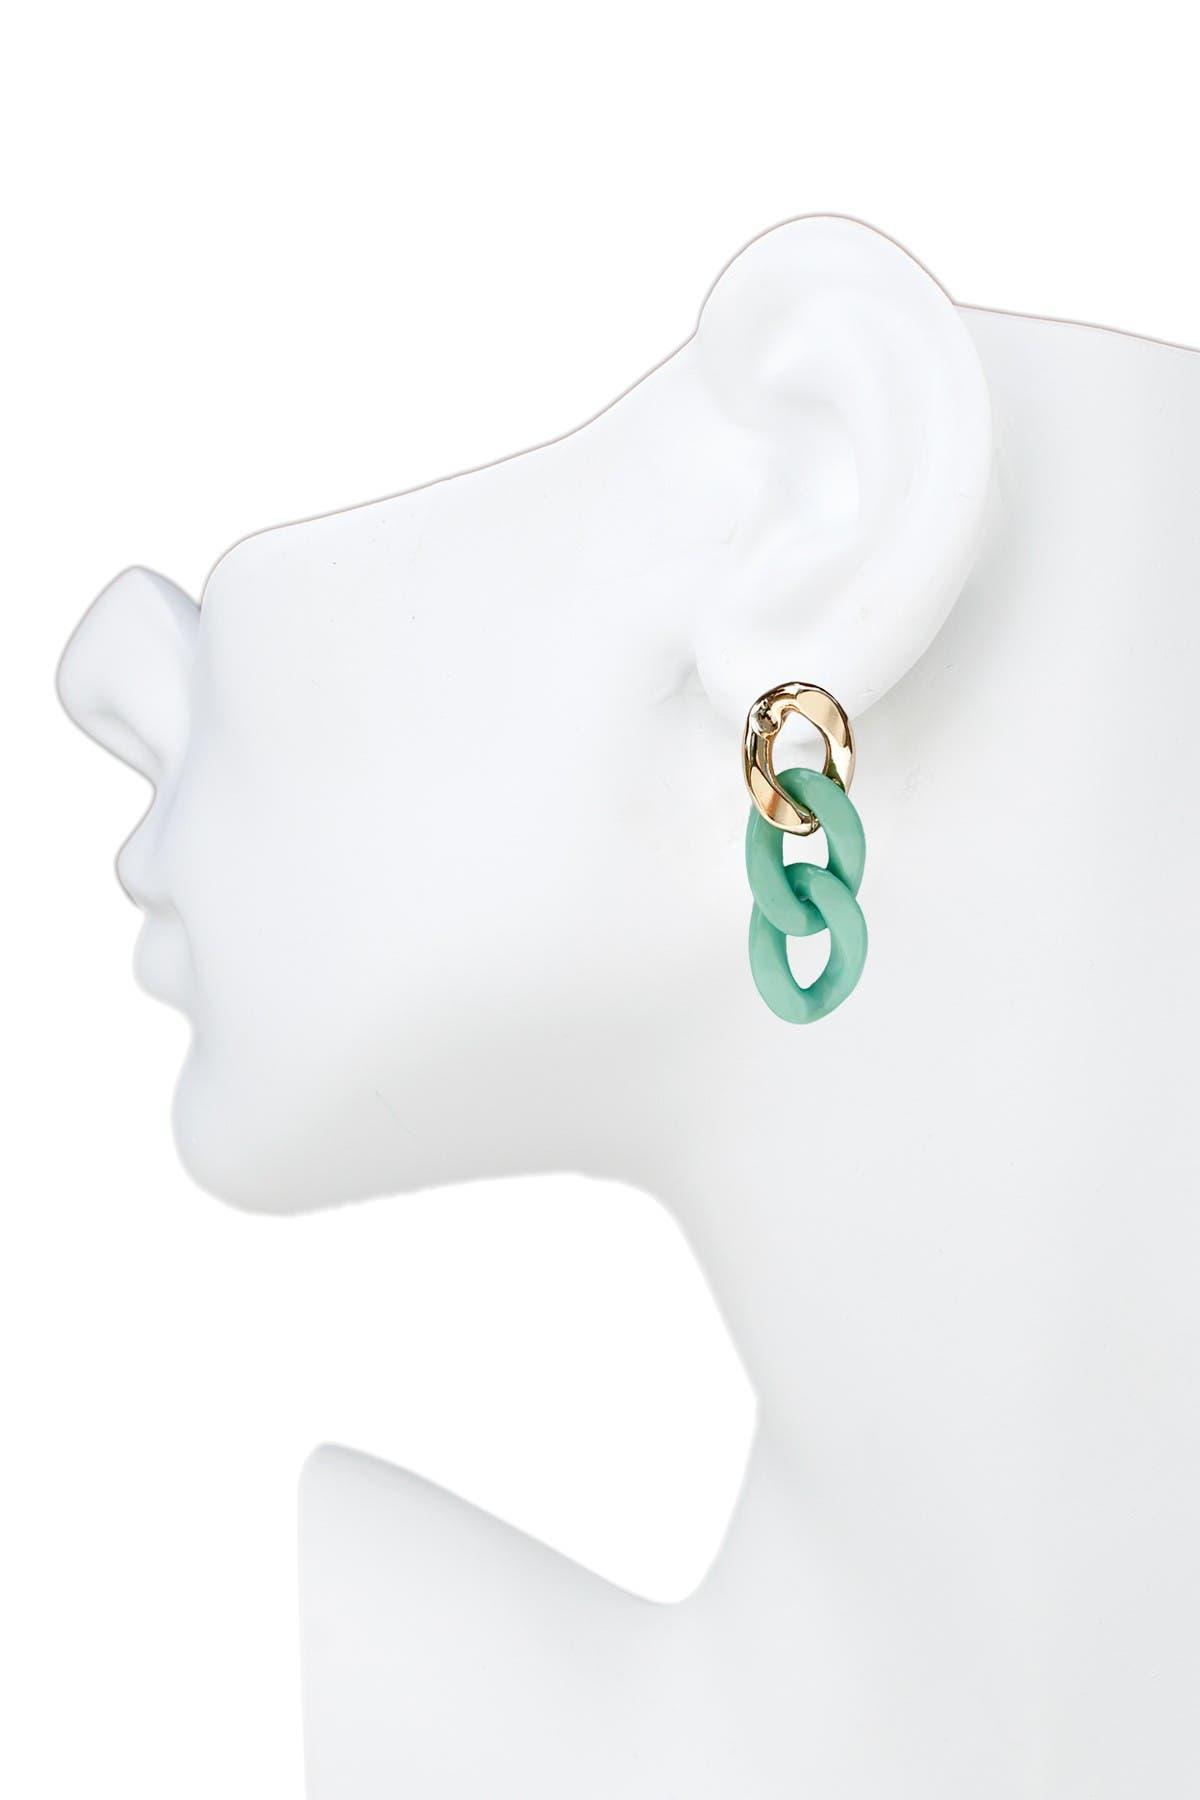 Image of Jardin Colorblock Curb Chain Link Drop Earrings